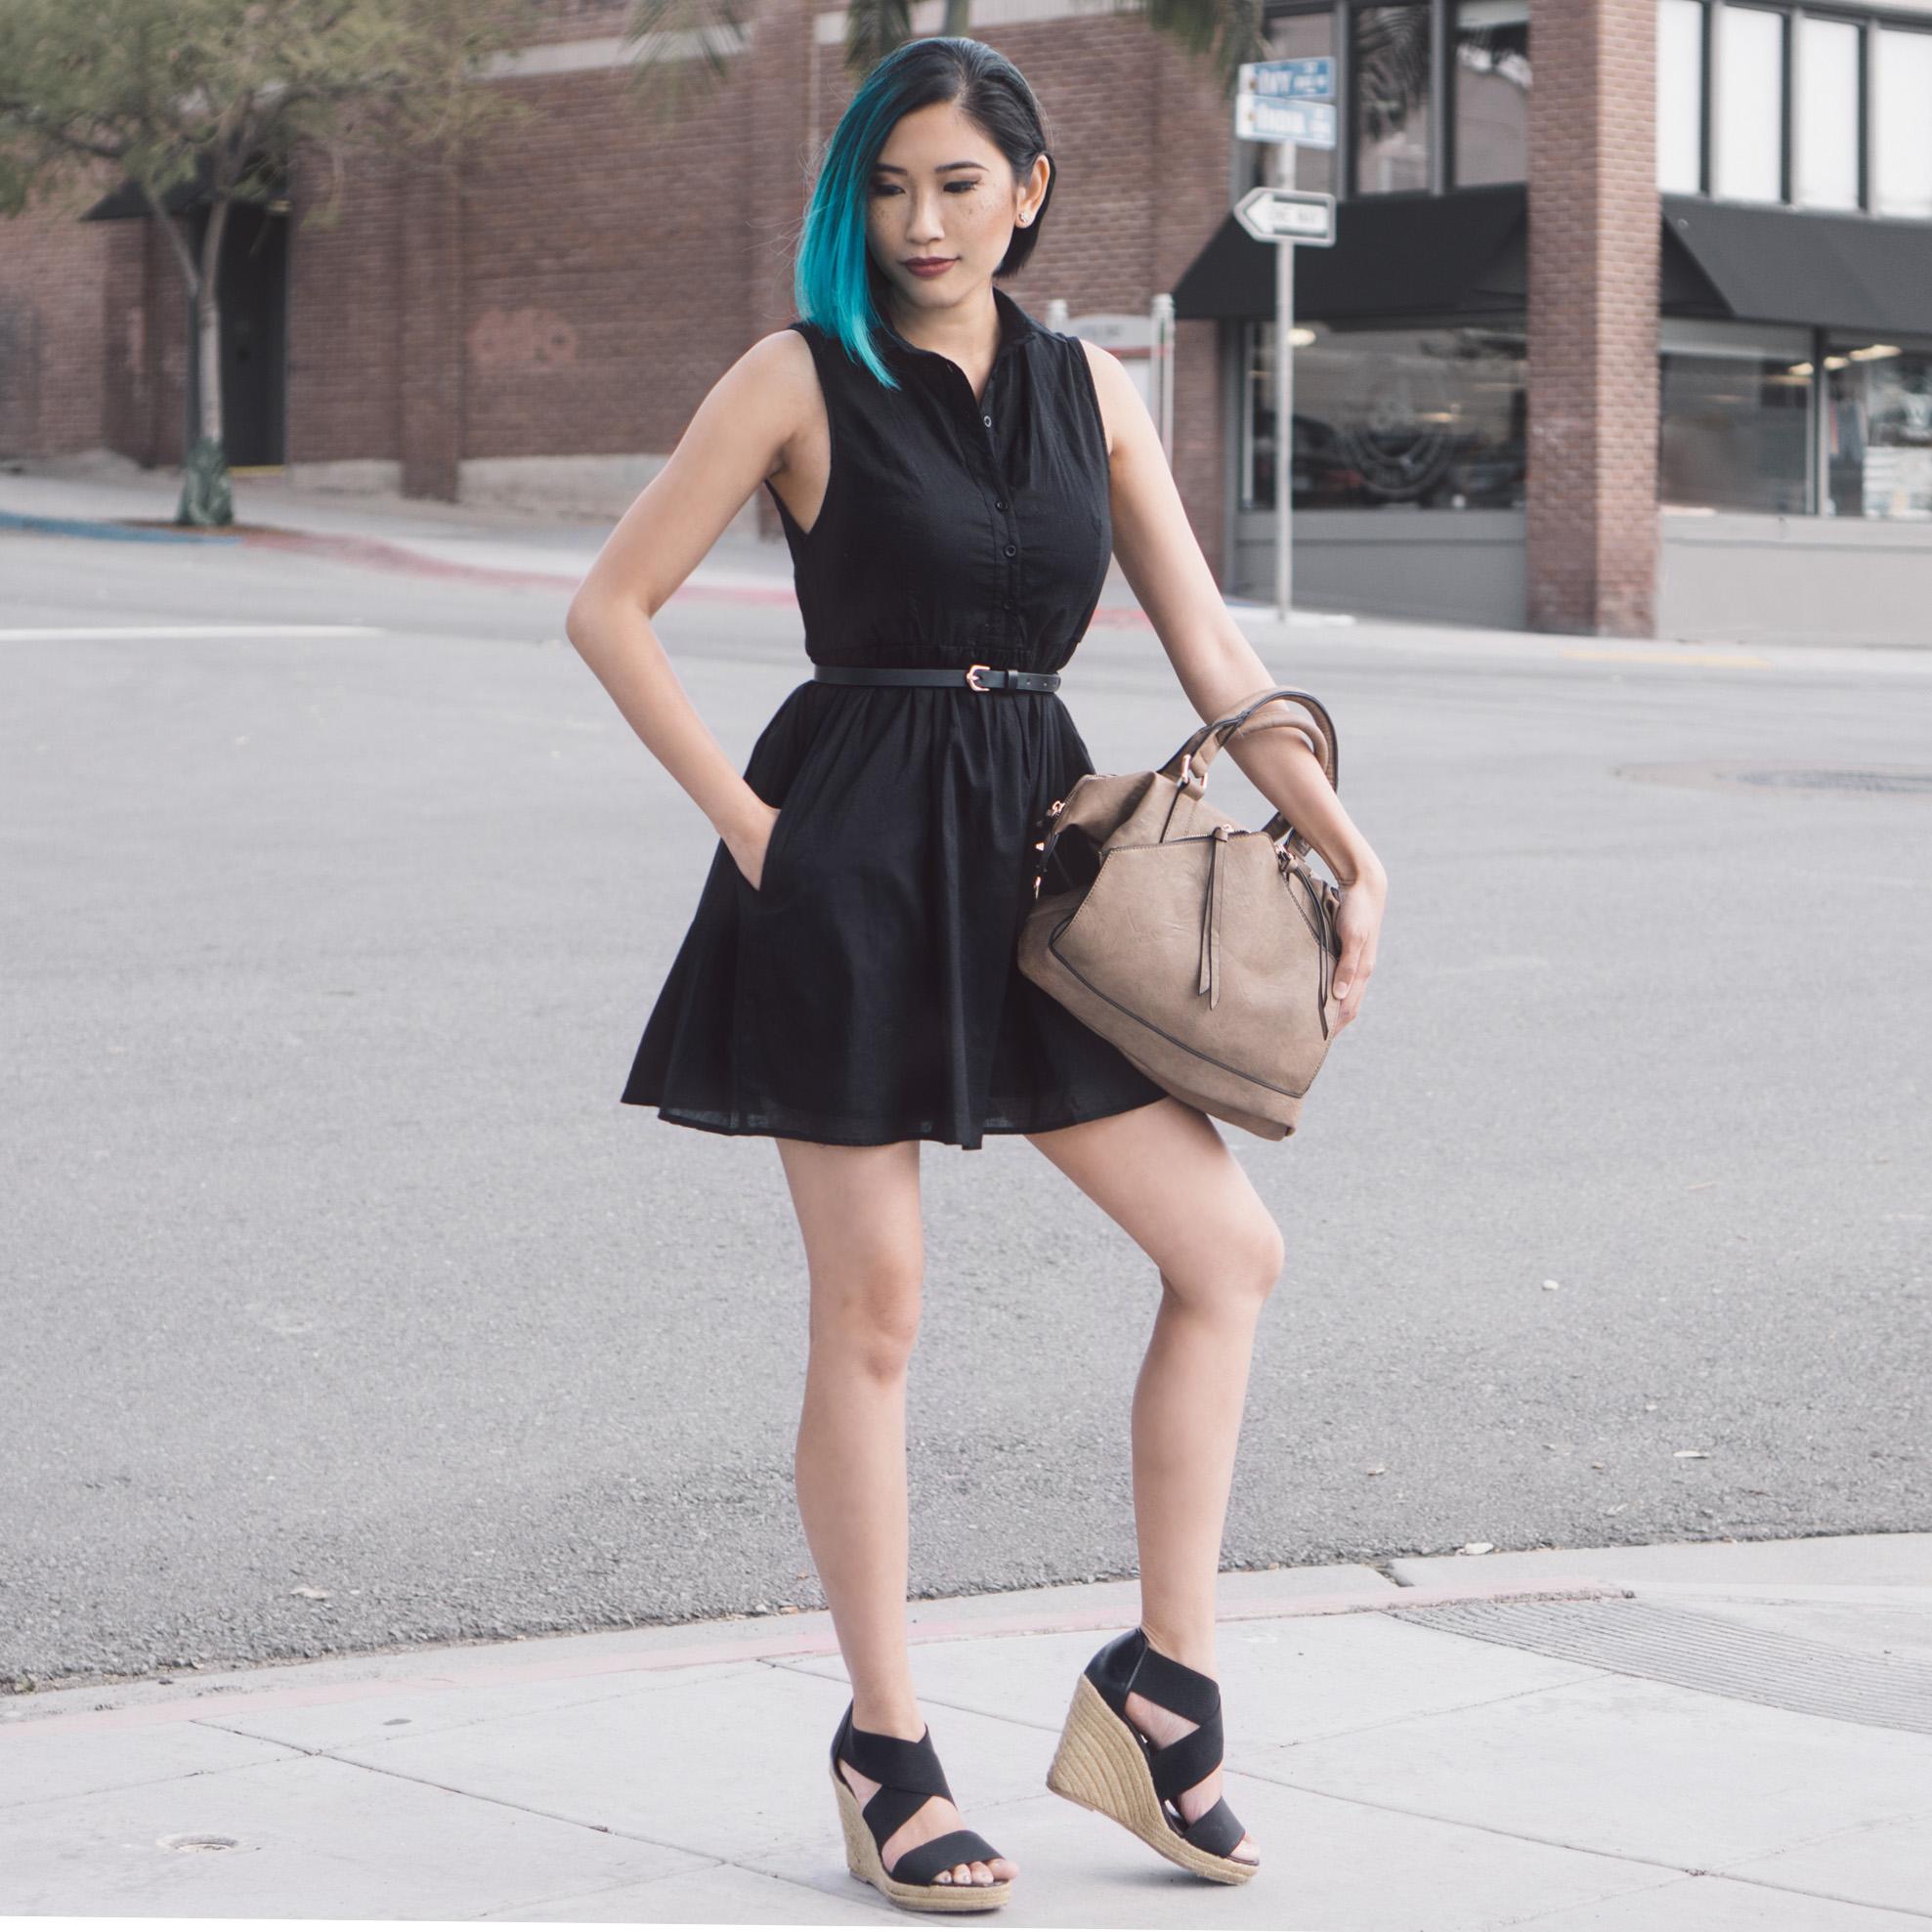 Dress :  Kate Boss Flare Dress    Bag :  Hayley Satchel Taupe    Shoes :  Steven Madden